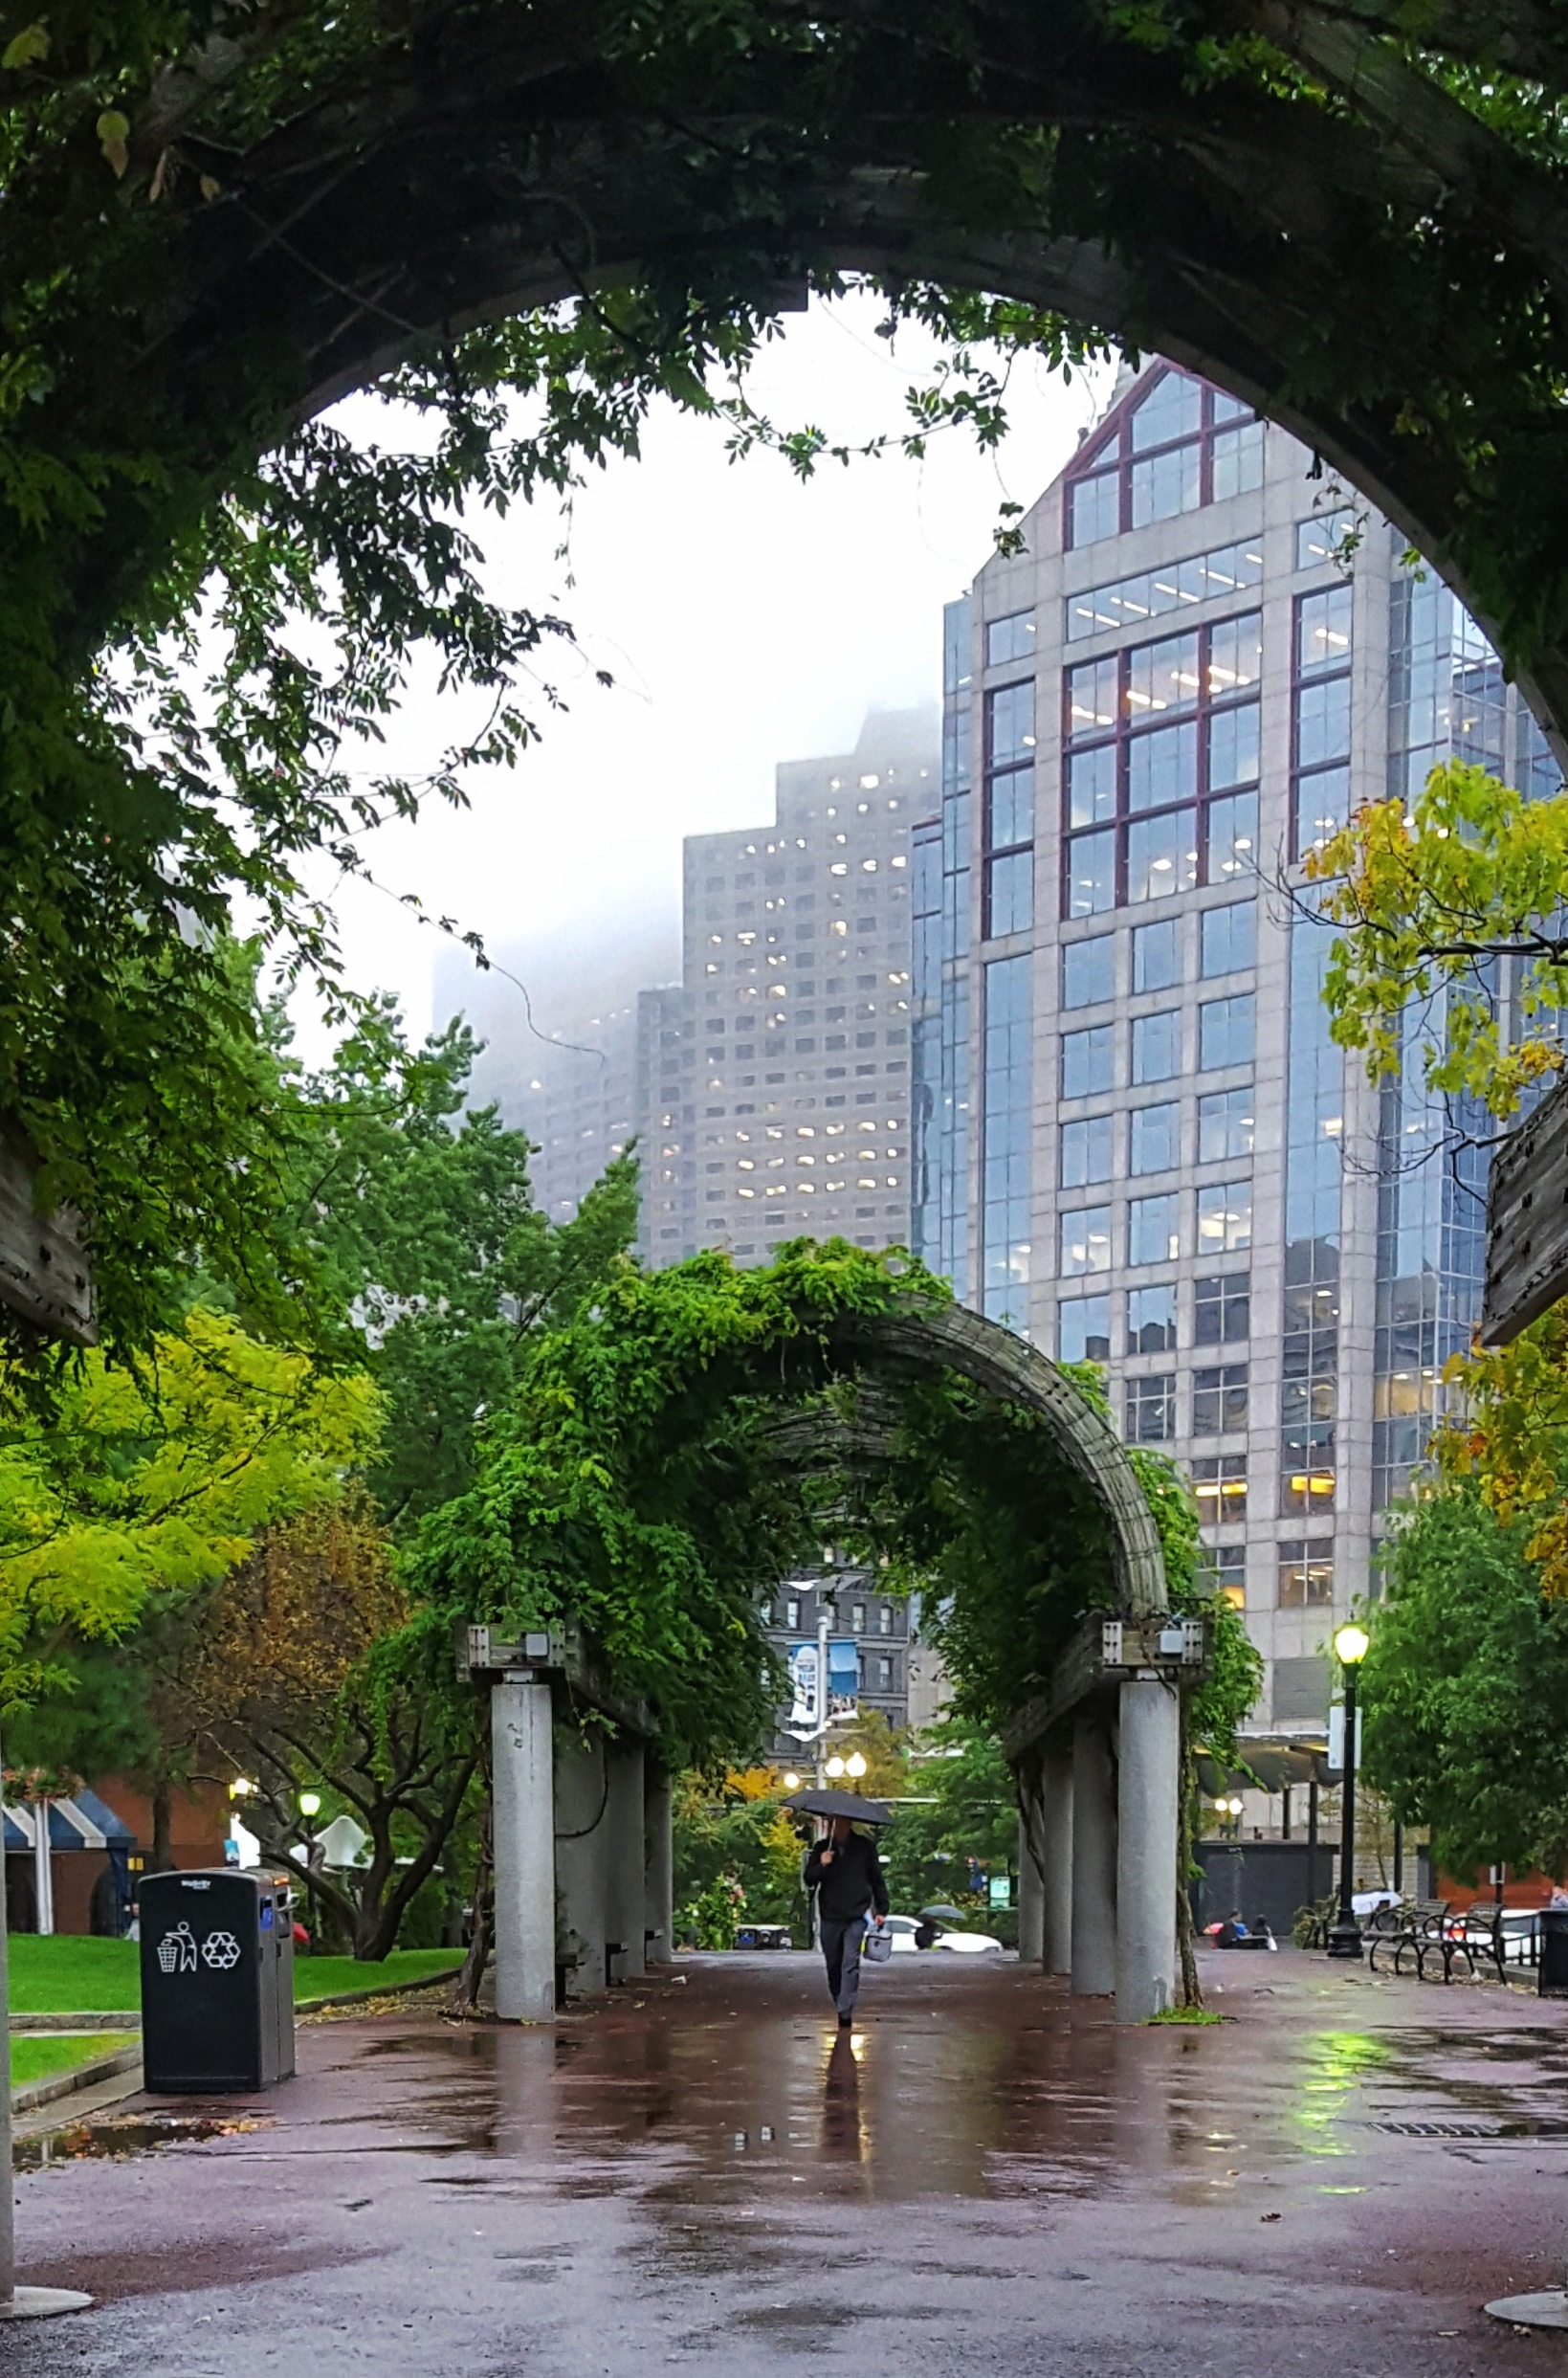 @jaznet77 - Christopher Columbus Park, Boston, MA